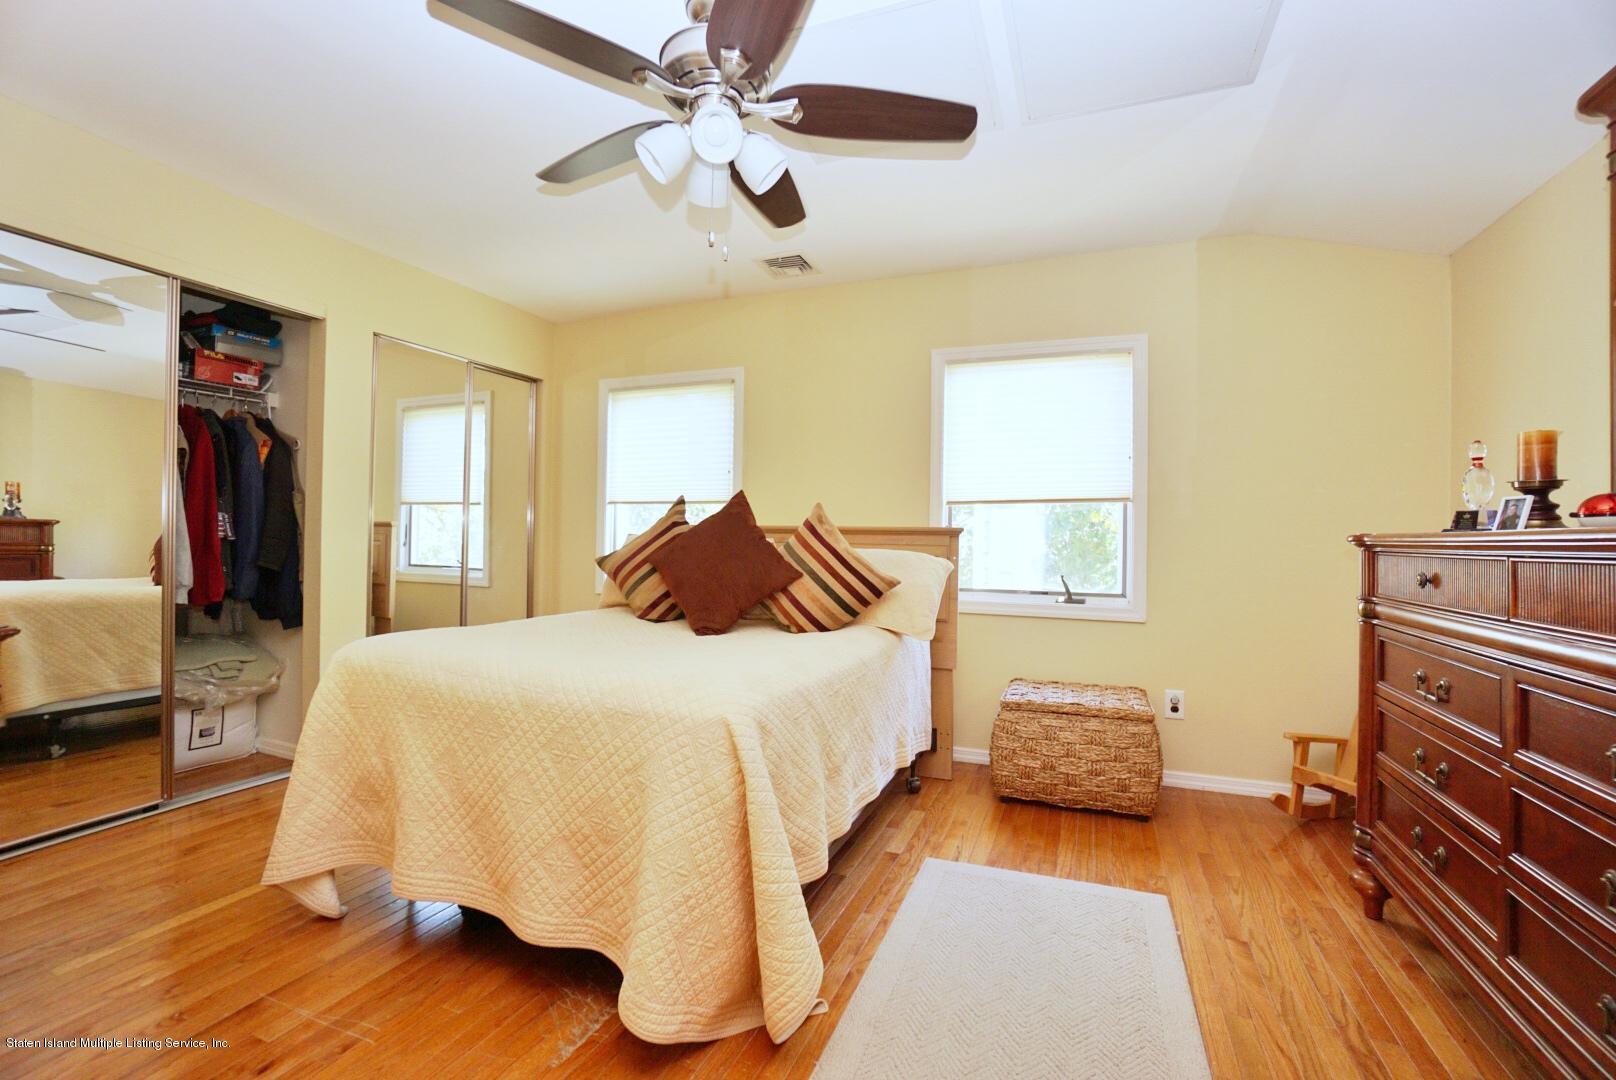 Single Family - Semi-Attached 47 Ilyse Court   Staten Island, NY 10306, MLS-1141335-19